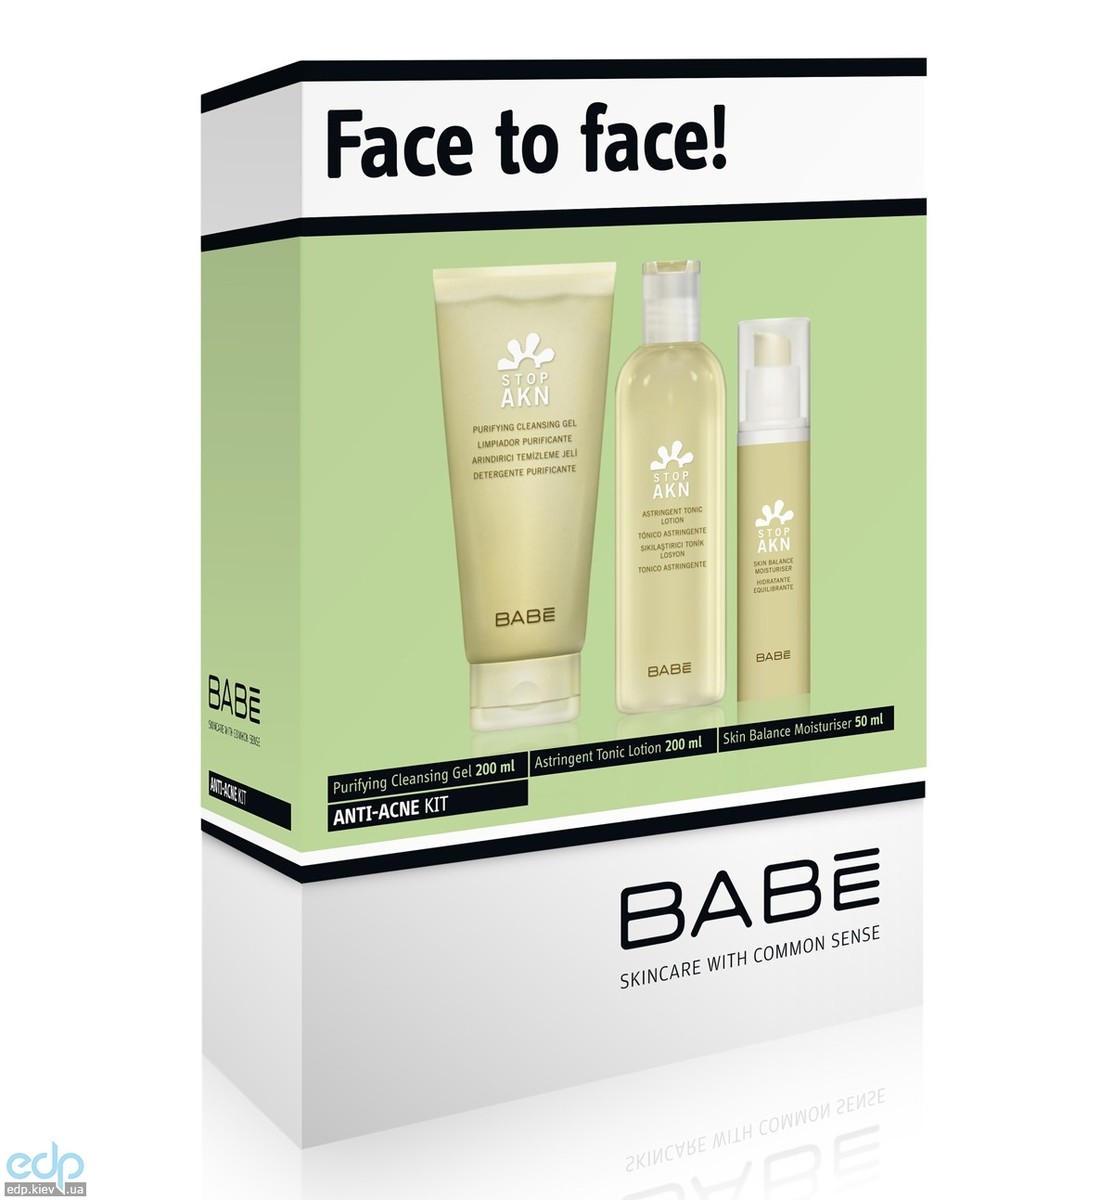 Babe Laboratorios - Набор для лица (Тоник, сужающий поры + Балансирующий увлажняющий крем + Очищающий гель ) - 50 ml + 200 ml + 50 ml (арт. ST0033)